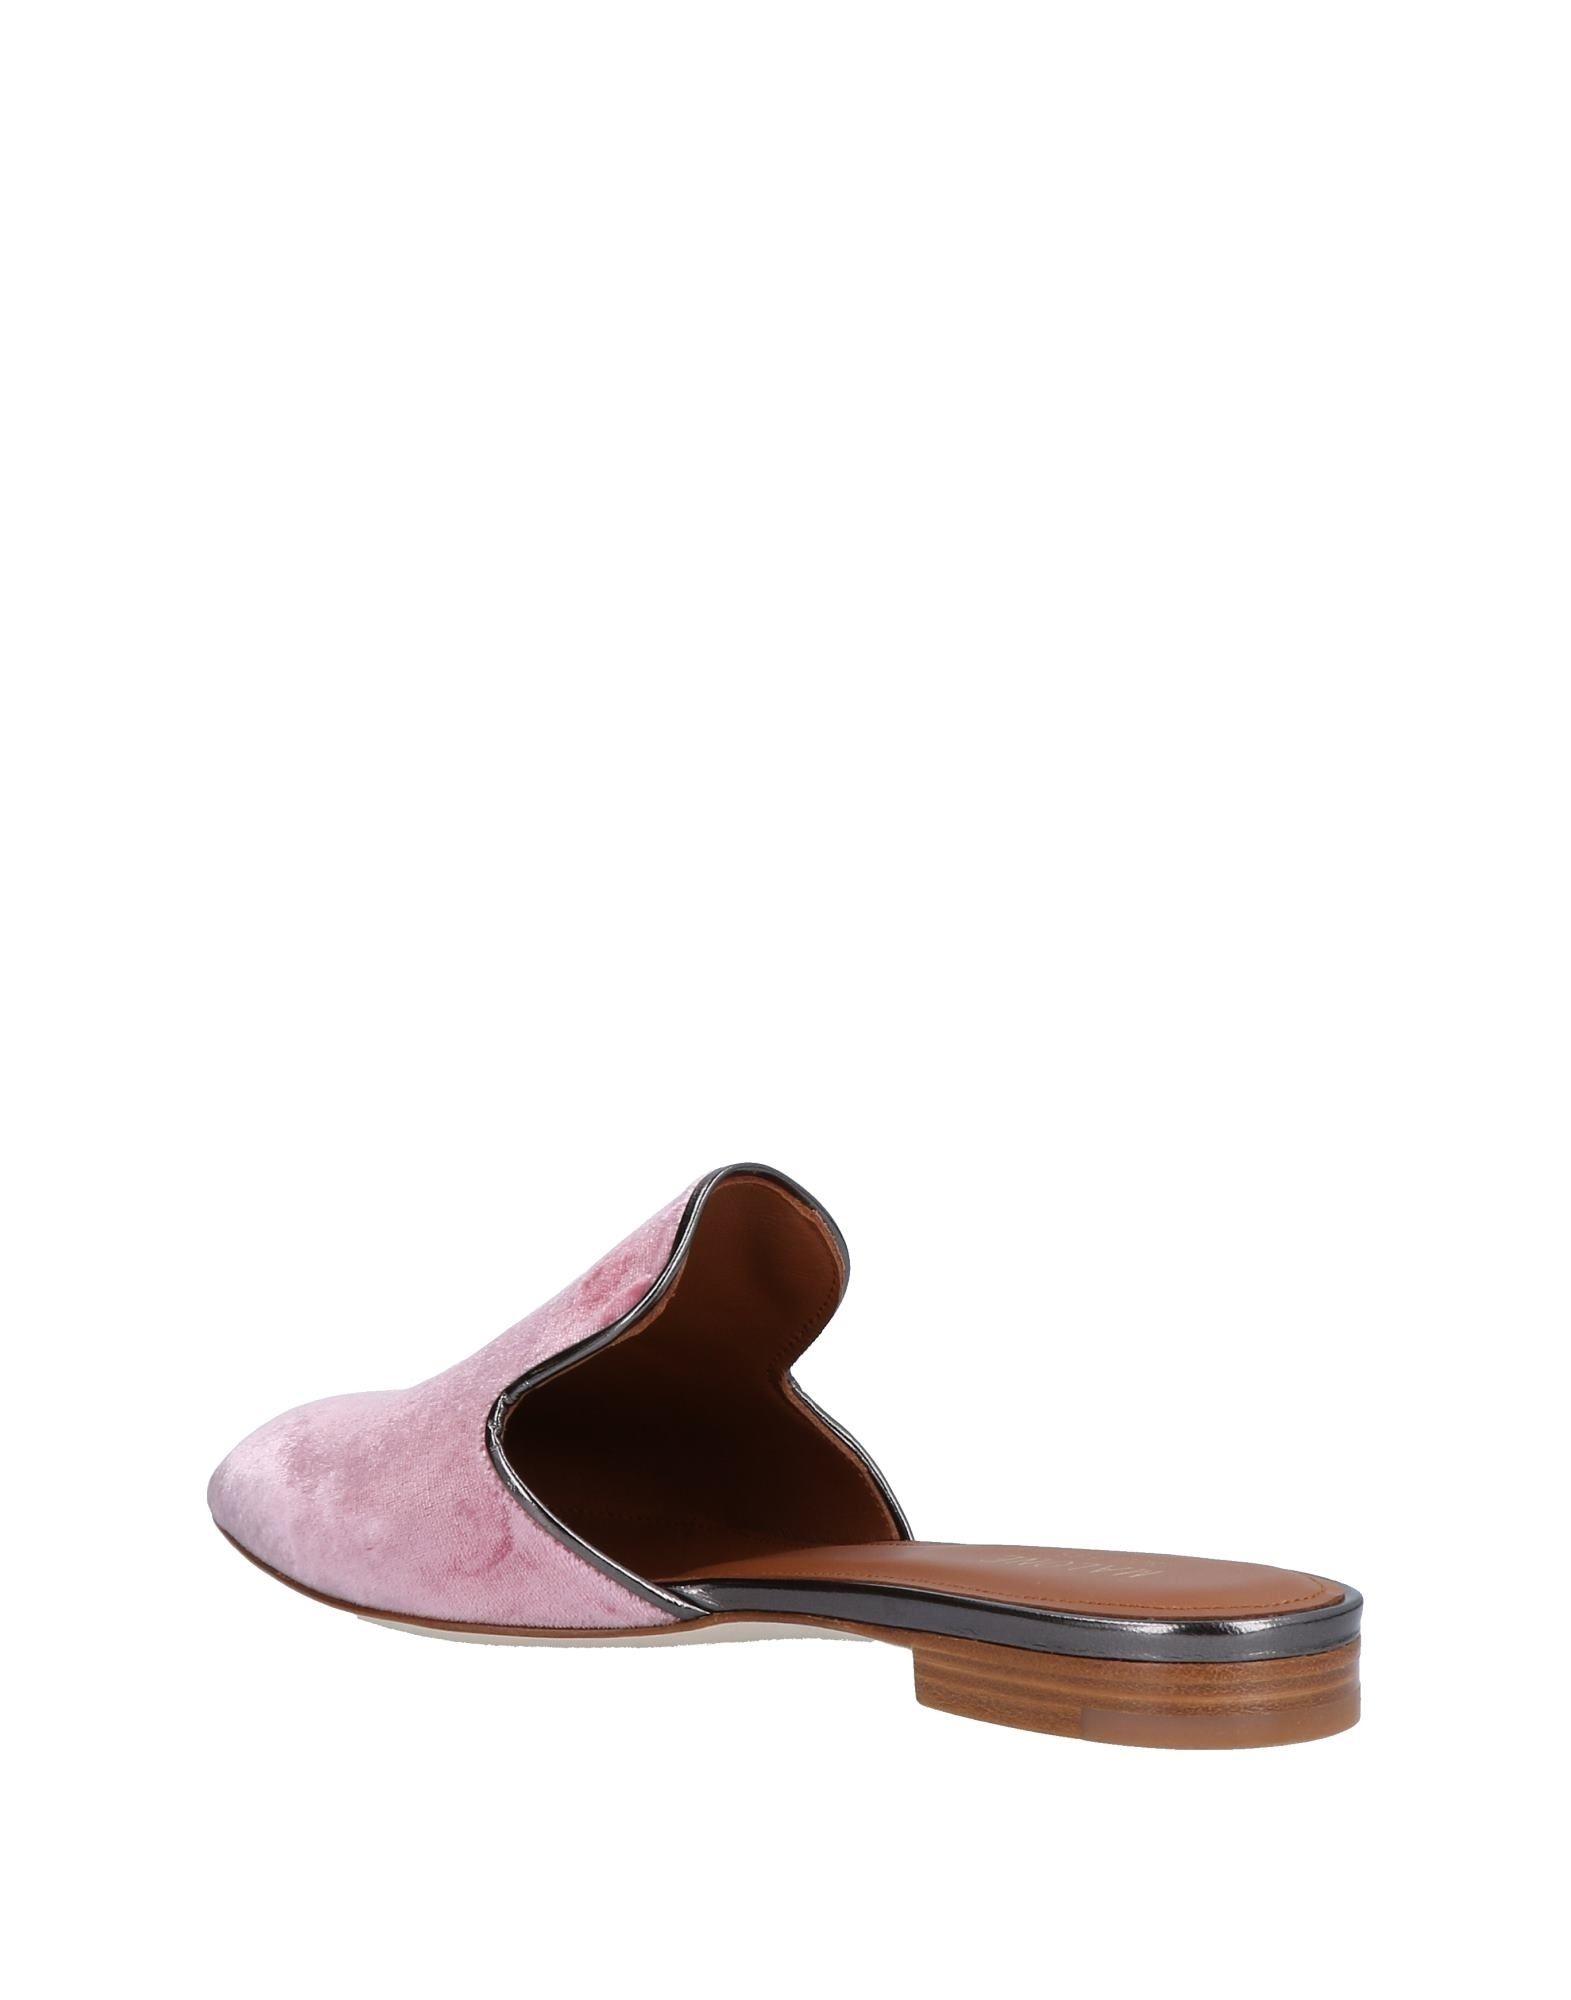 Rabatt Schuhe  Malone Souliers Pantoletten Damen  Schuhe 11520913SM eba48e